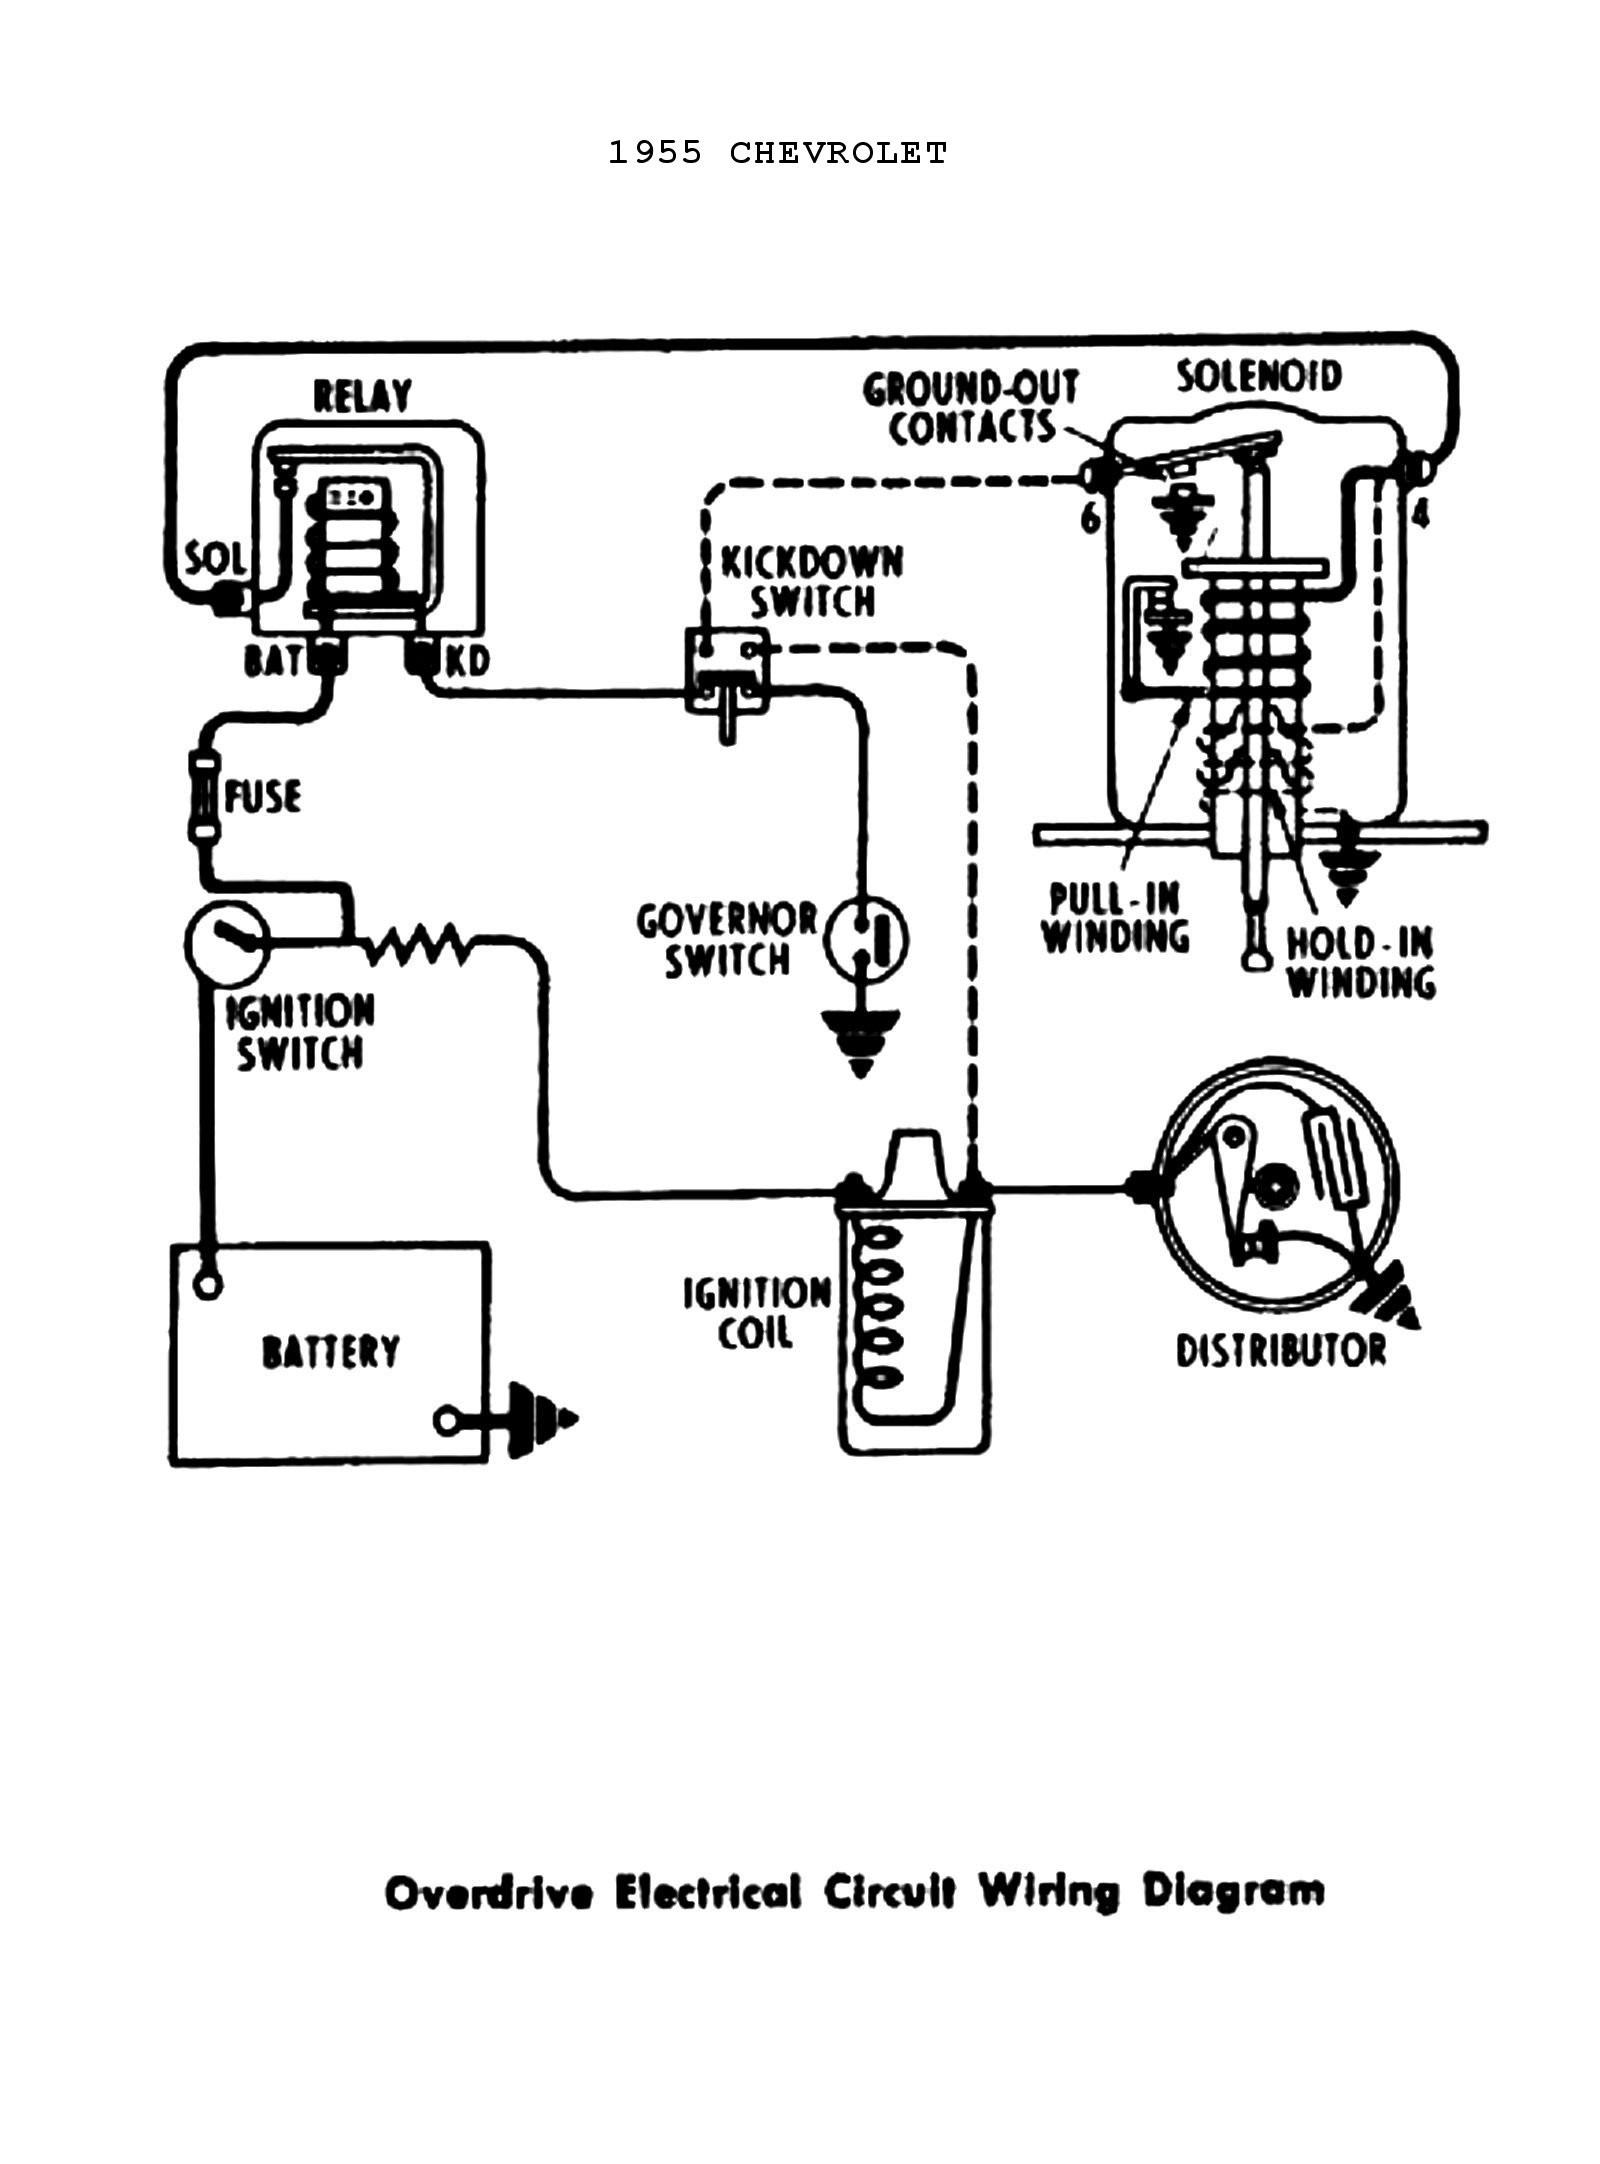 Underside Of Car Diagram Chevy Wiring Diagrams Of Underside Of Car Diagram